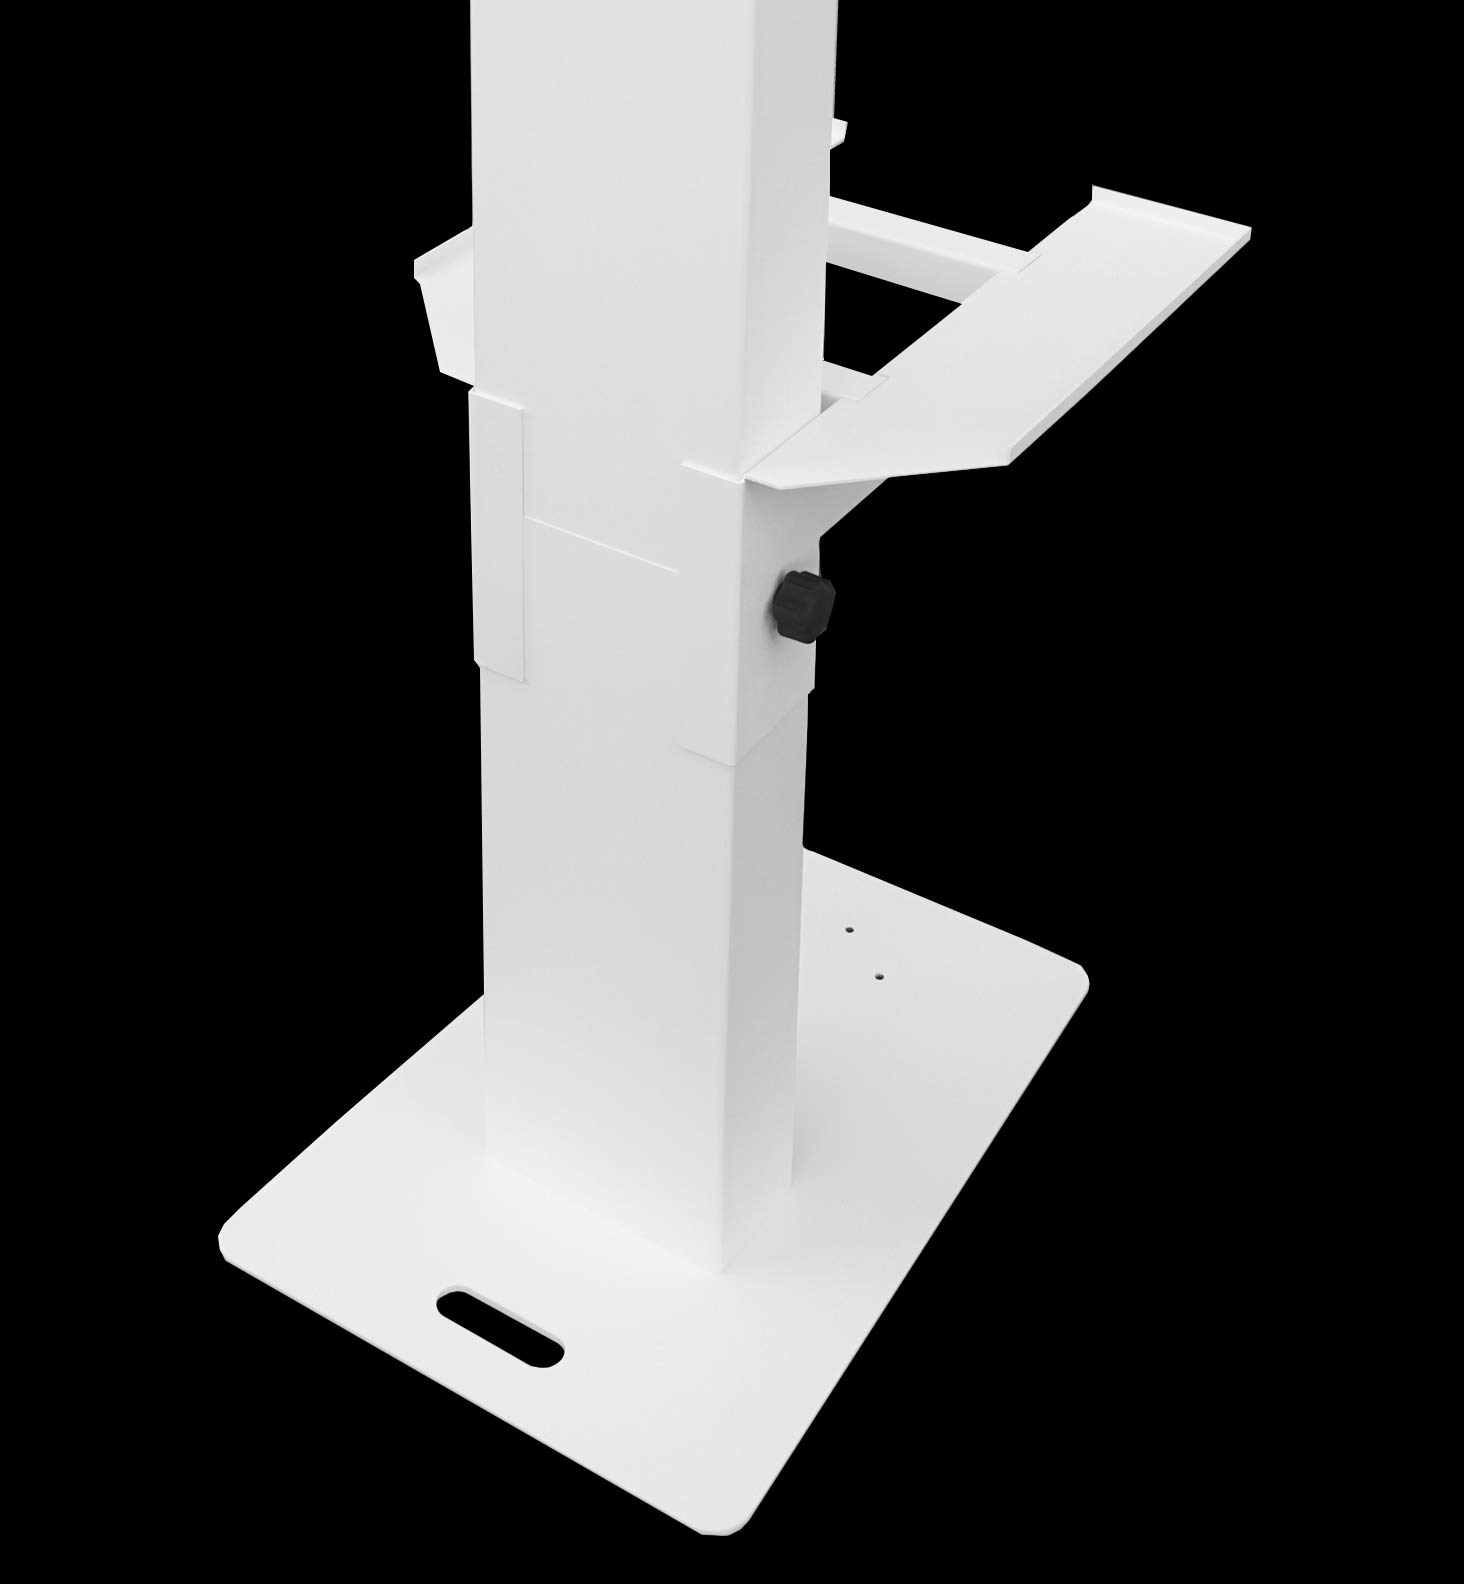 T- Series Printer Shelf for T12 3.0 Eco Planar / T12 LED / T17 4.0 / T20 2.0 Eco Planar / T20R 2.0 Photobooth Shell